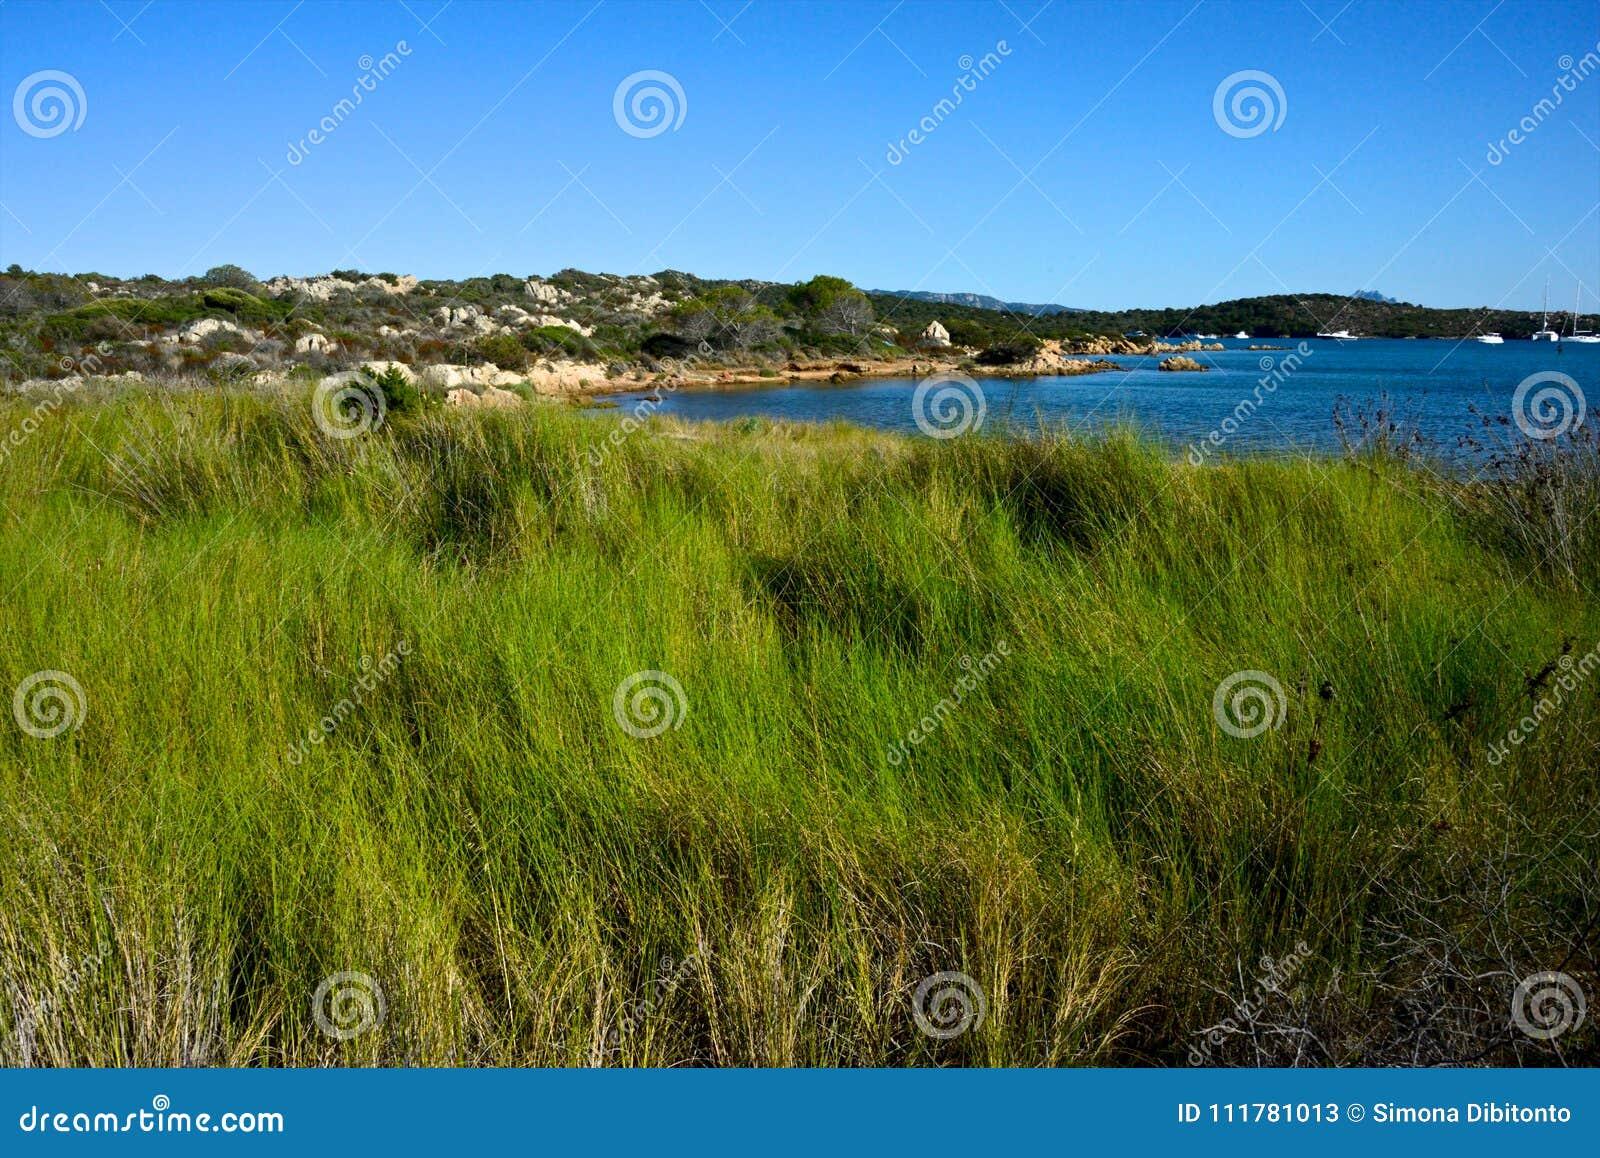 Field of green delicate grass in the wild nature near the sea